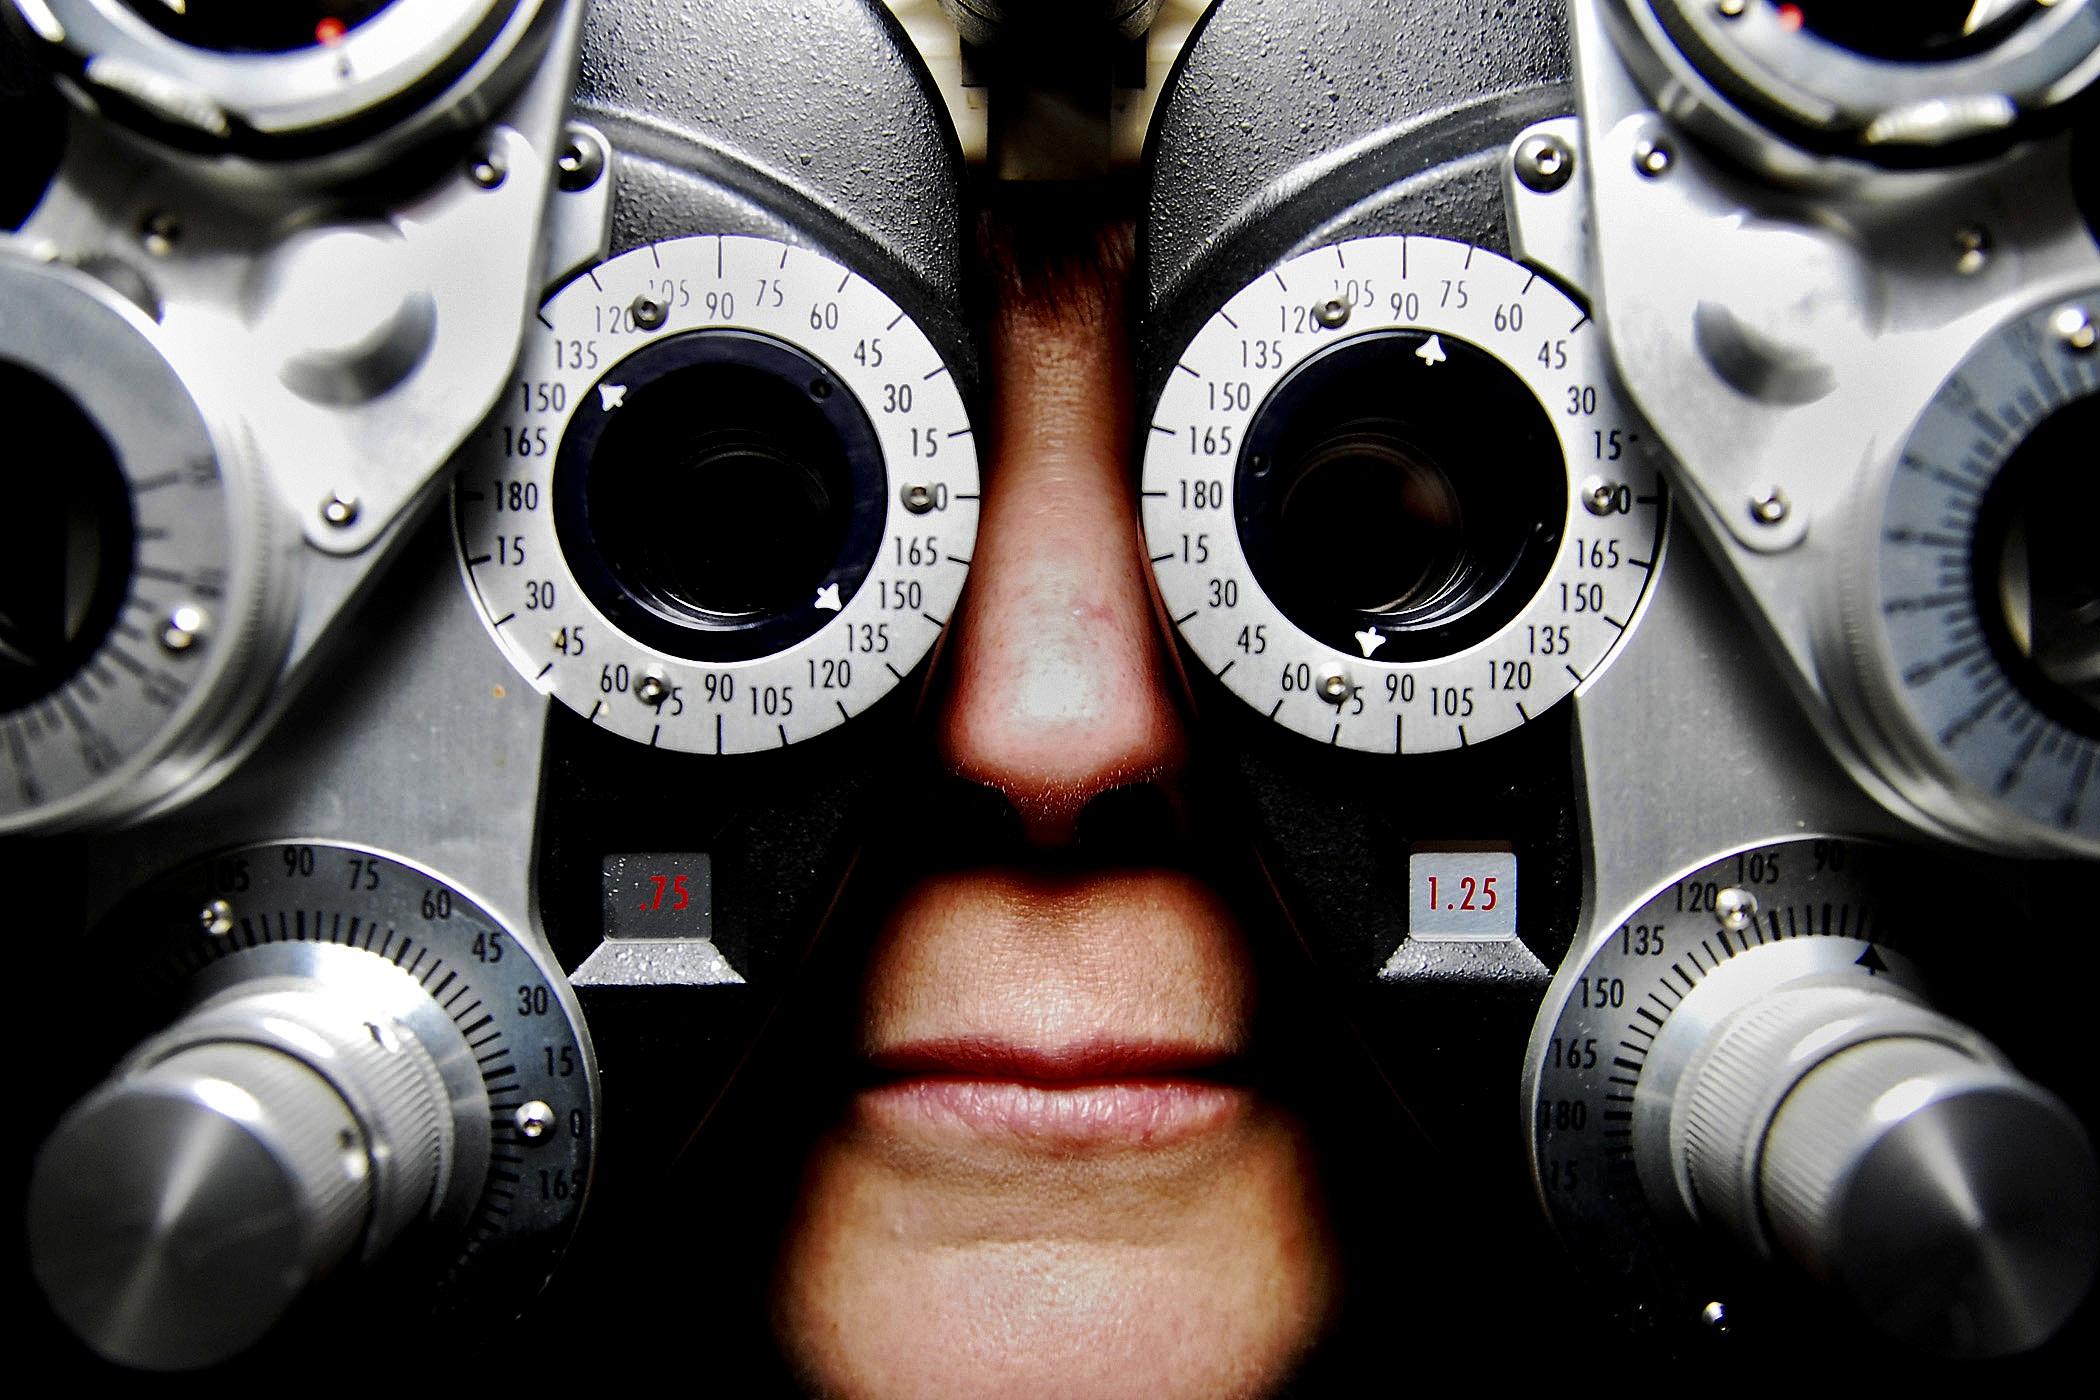 eyeglasses-679696